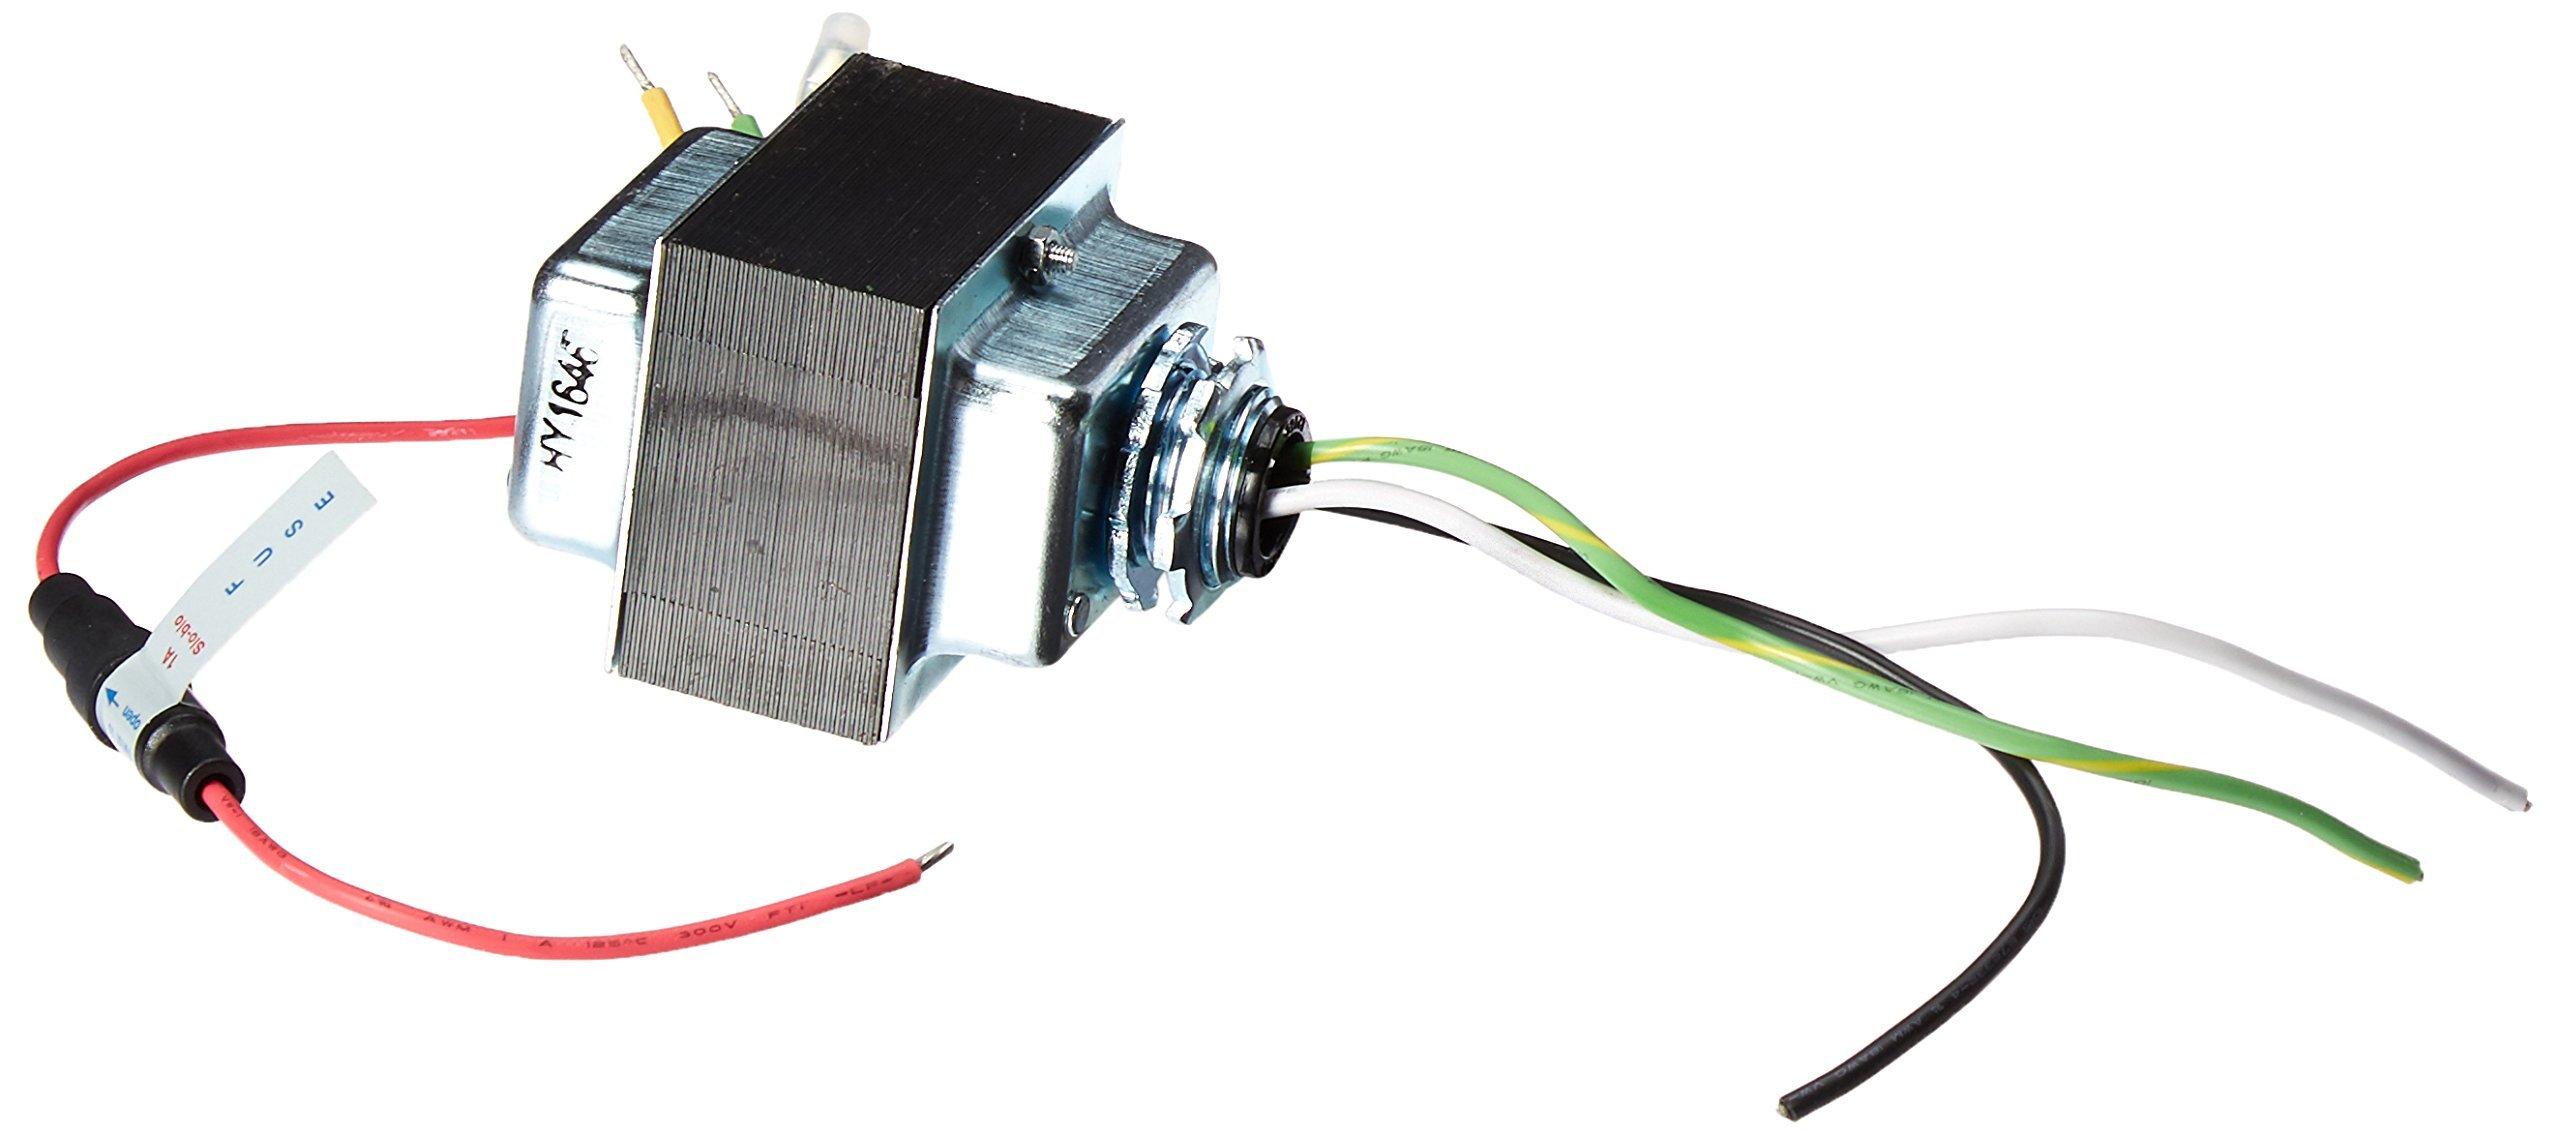 Weathermatic Pl1600-Sl1600 Series 120V Transformer